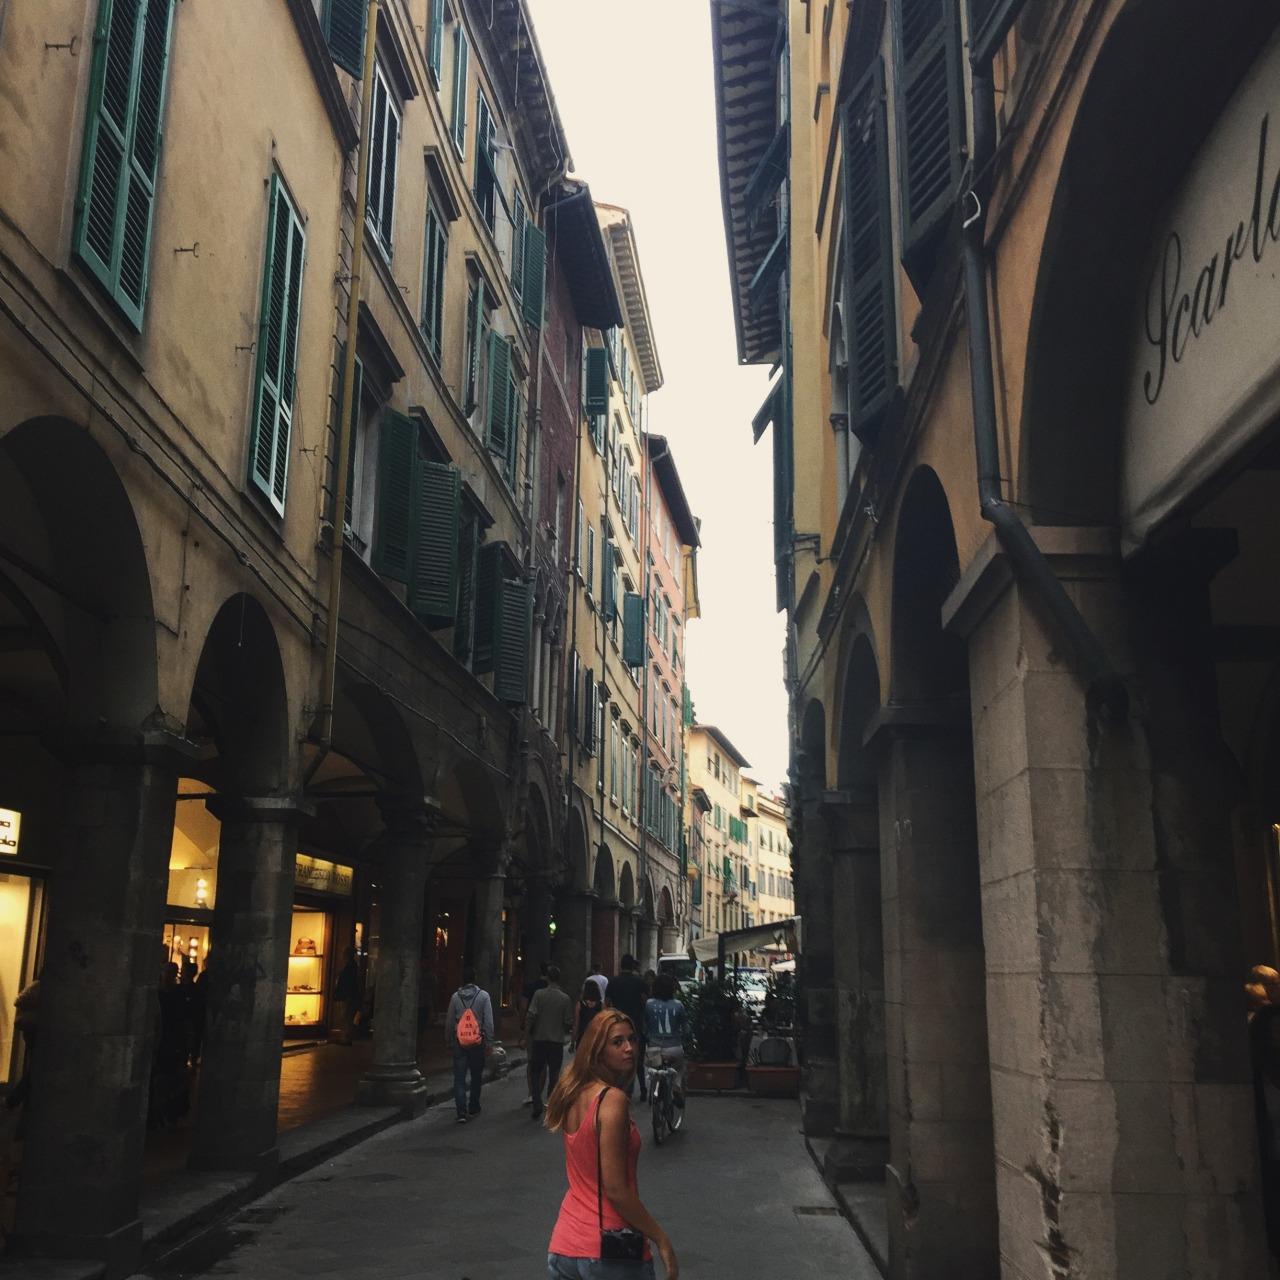 Day 17: Rome - Piza